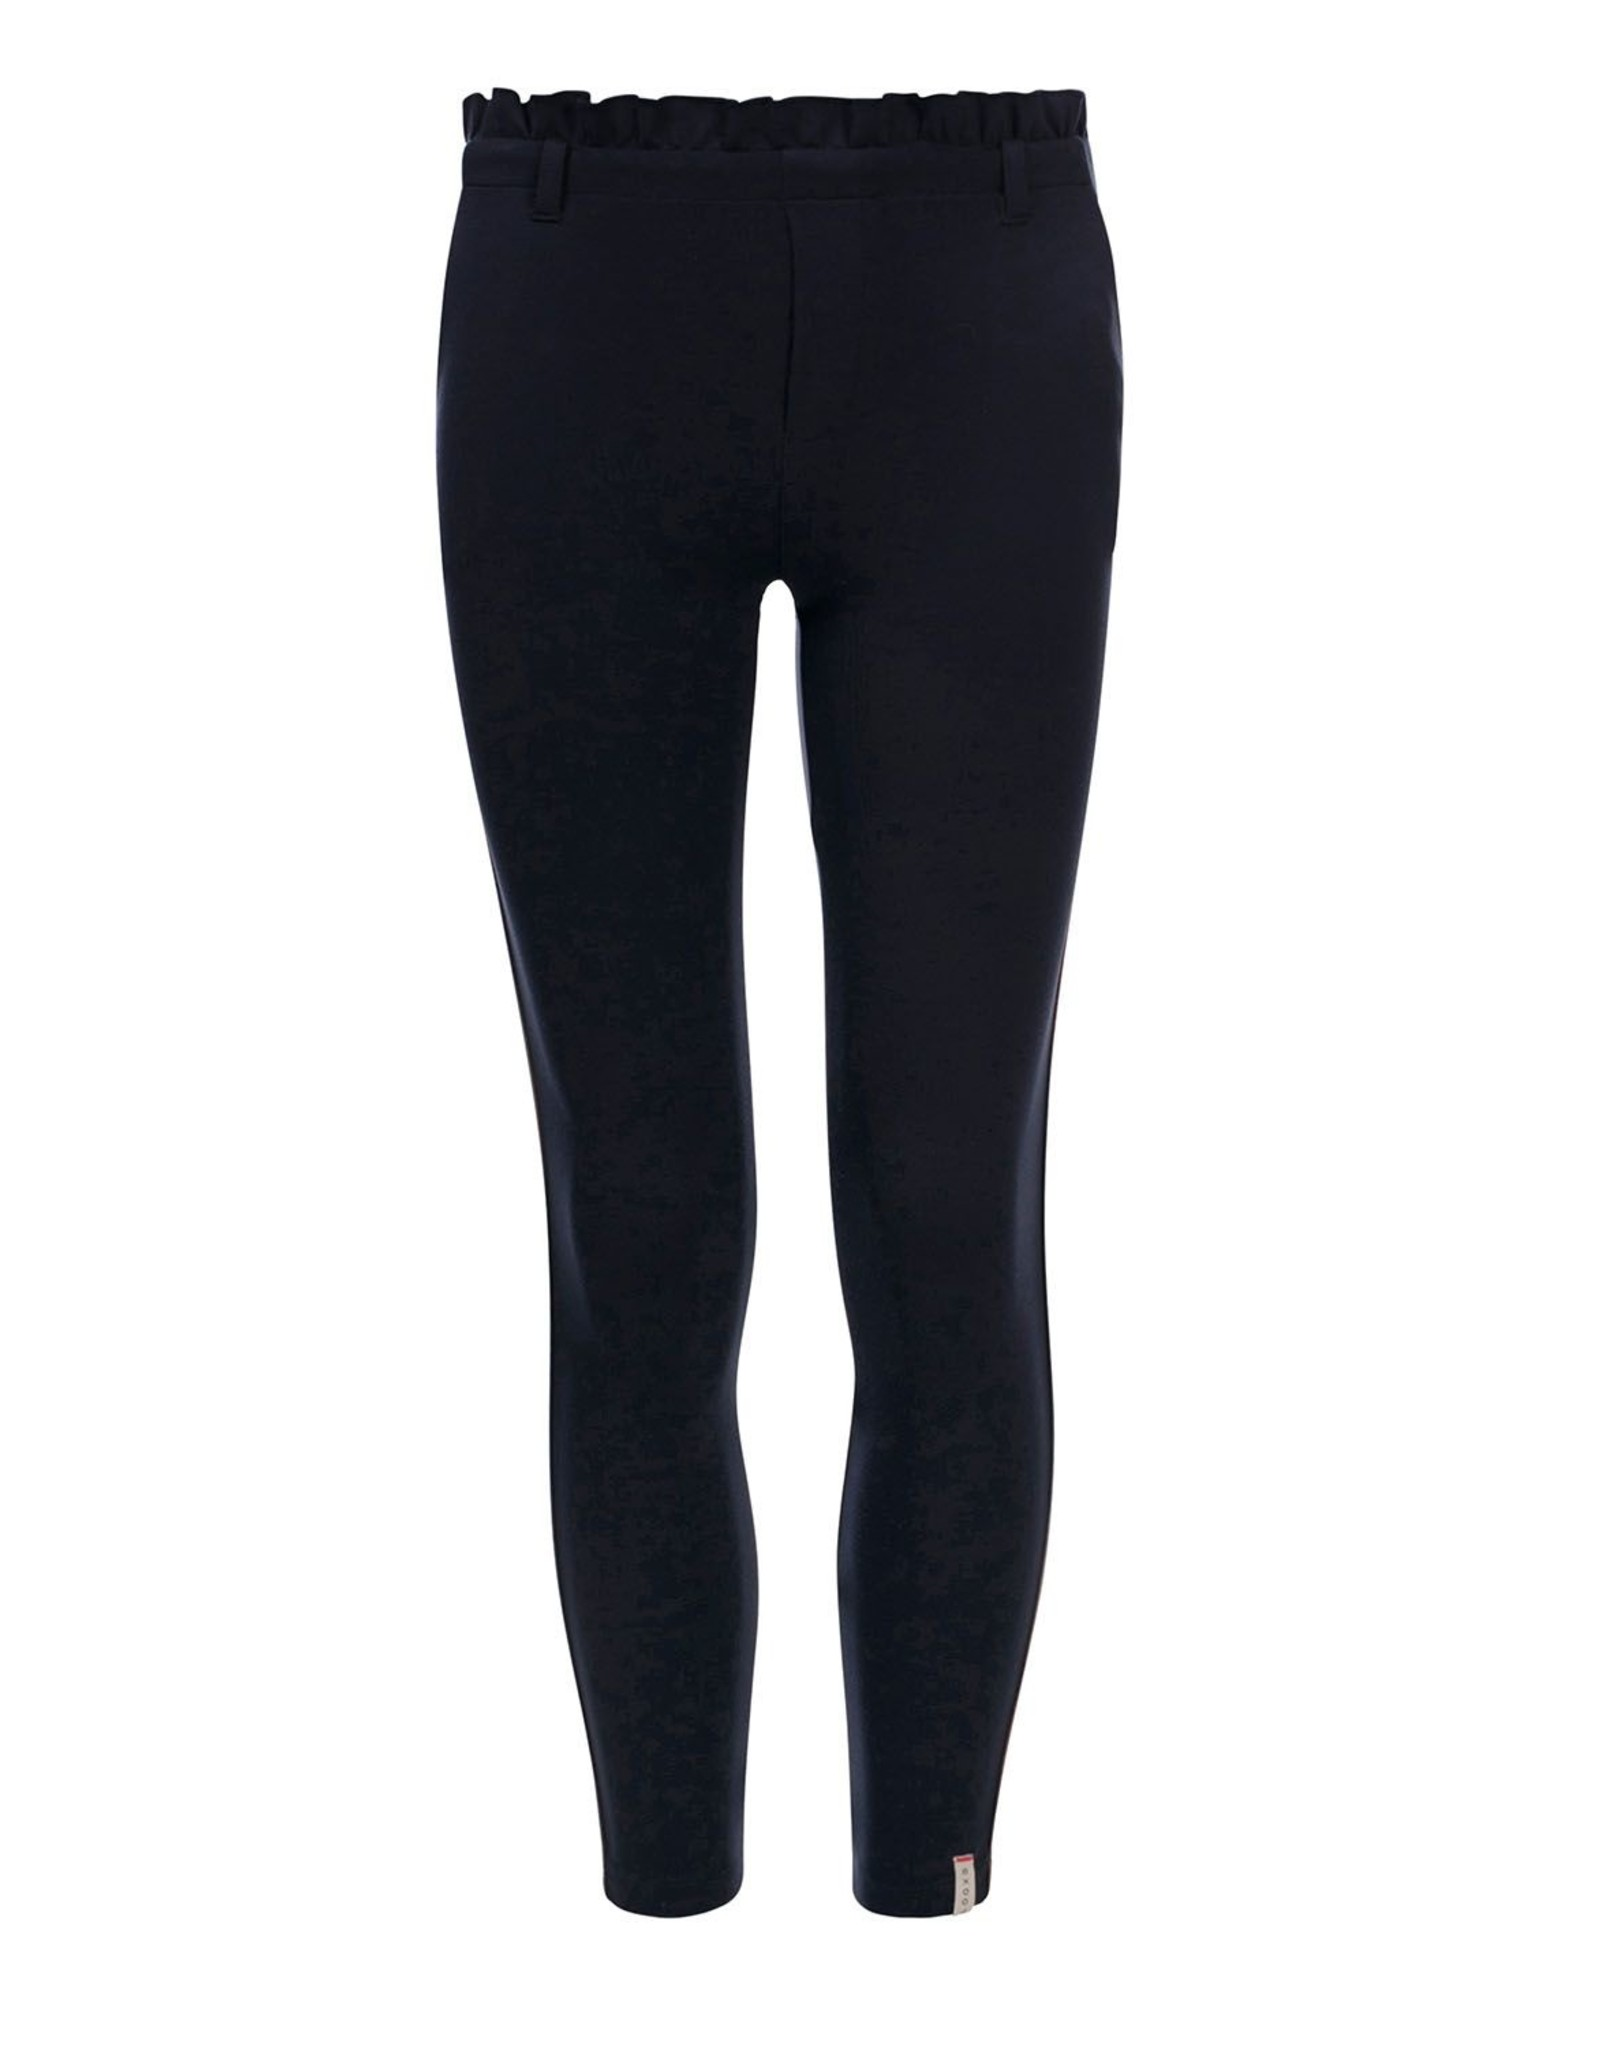 looxs 2132-5661 Paperbag Pants